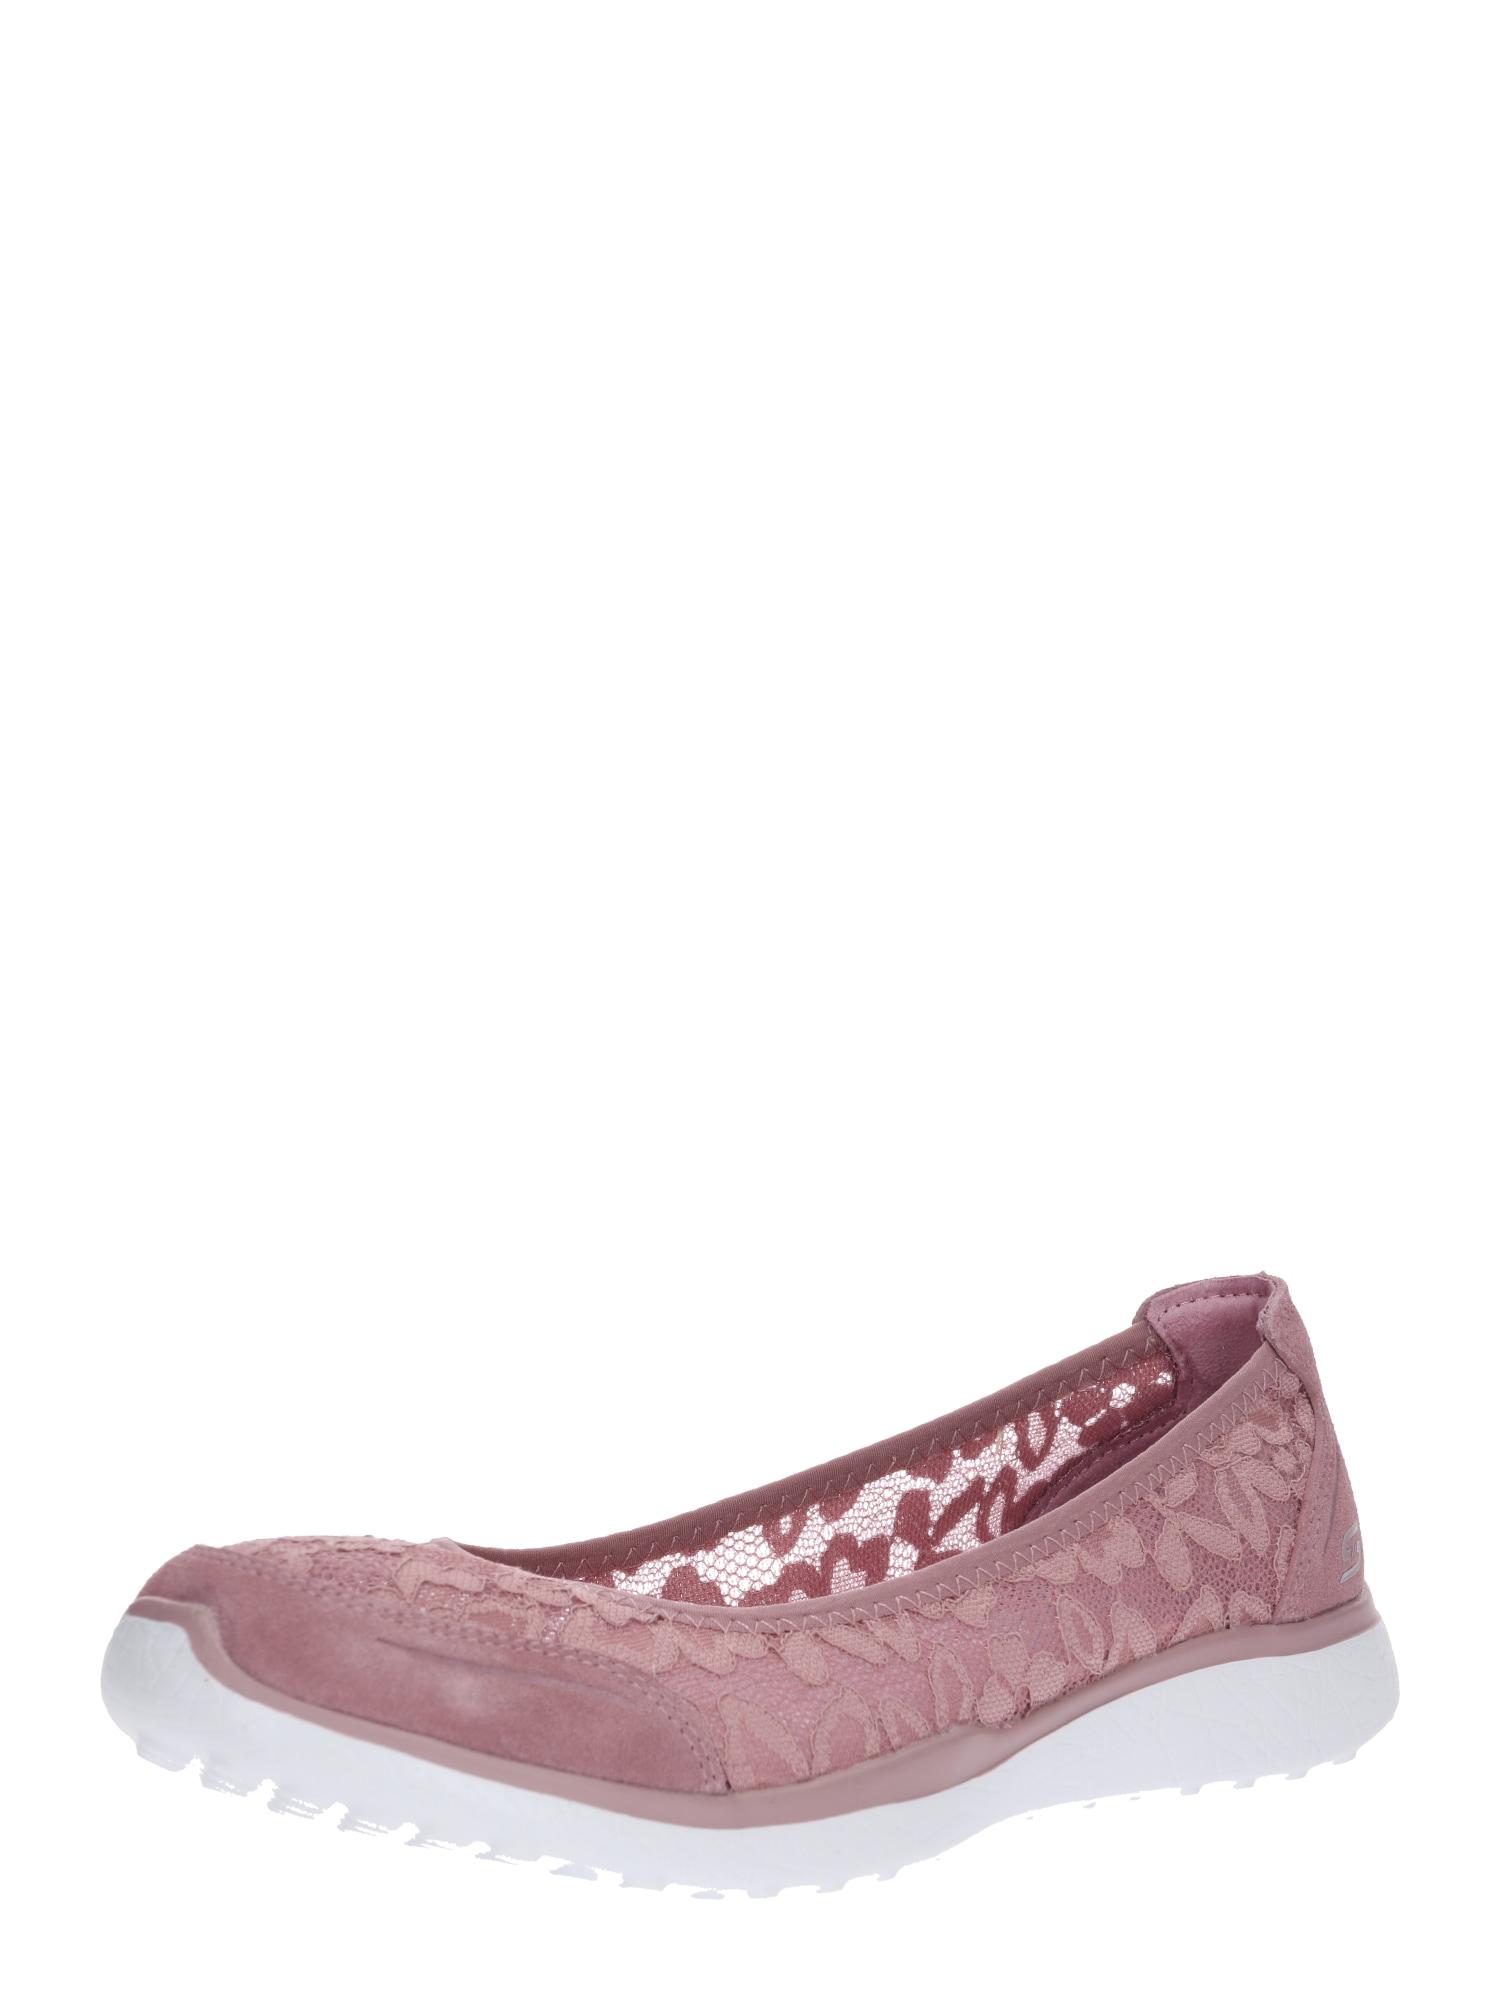 Slipper MICROBURST SWEET BLOOM pink SKECHERS